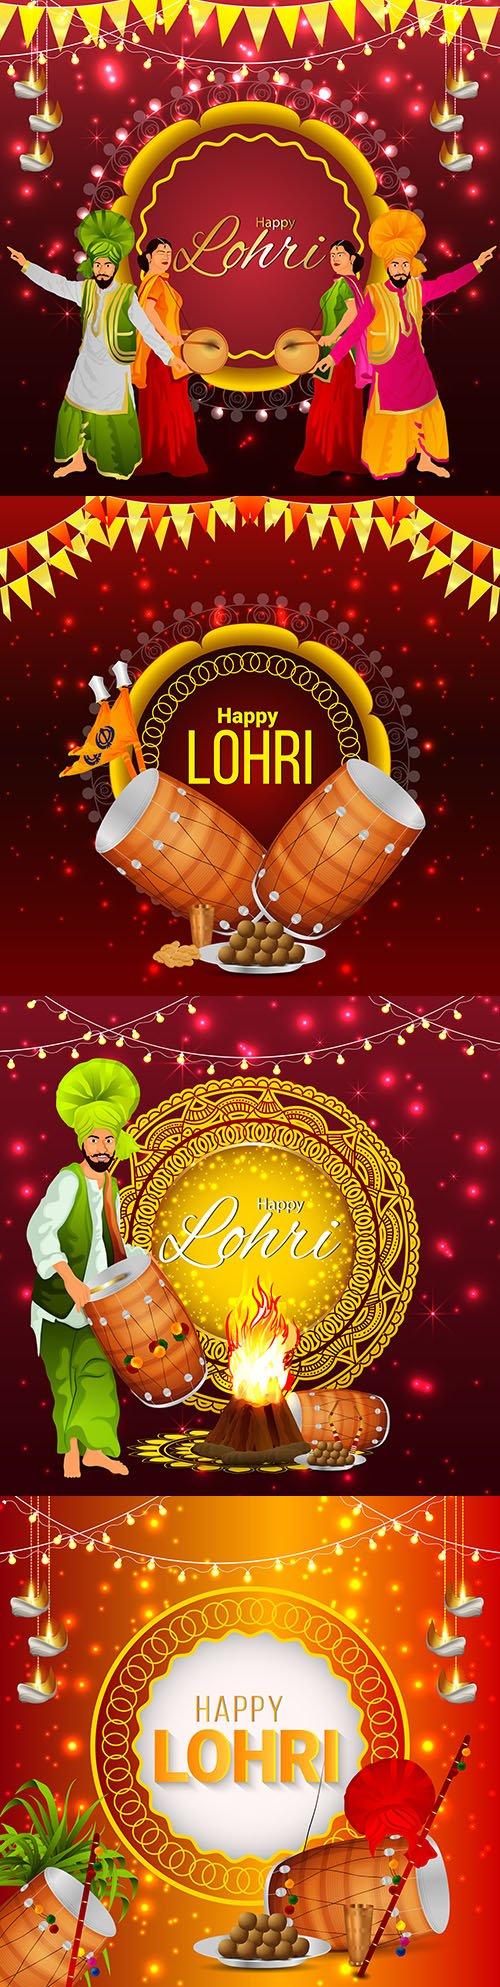 Happy Lohri Indian festival decorative illustration